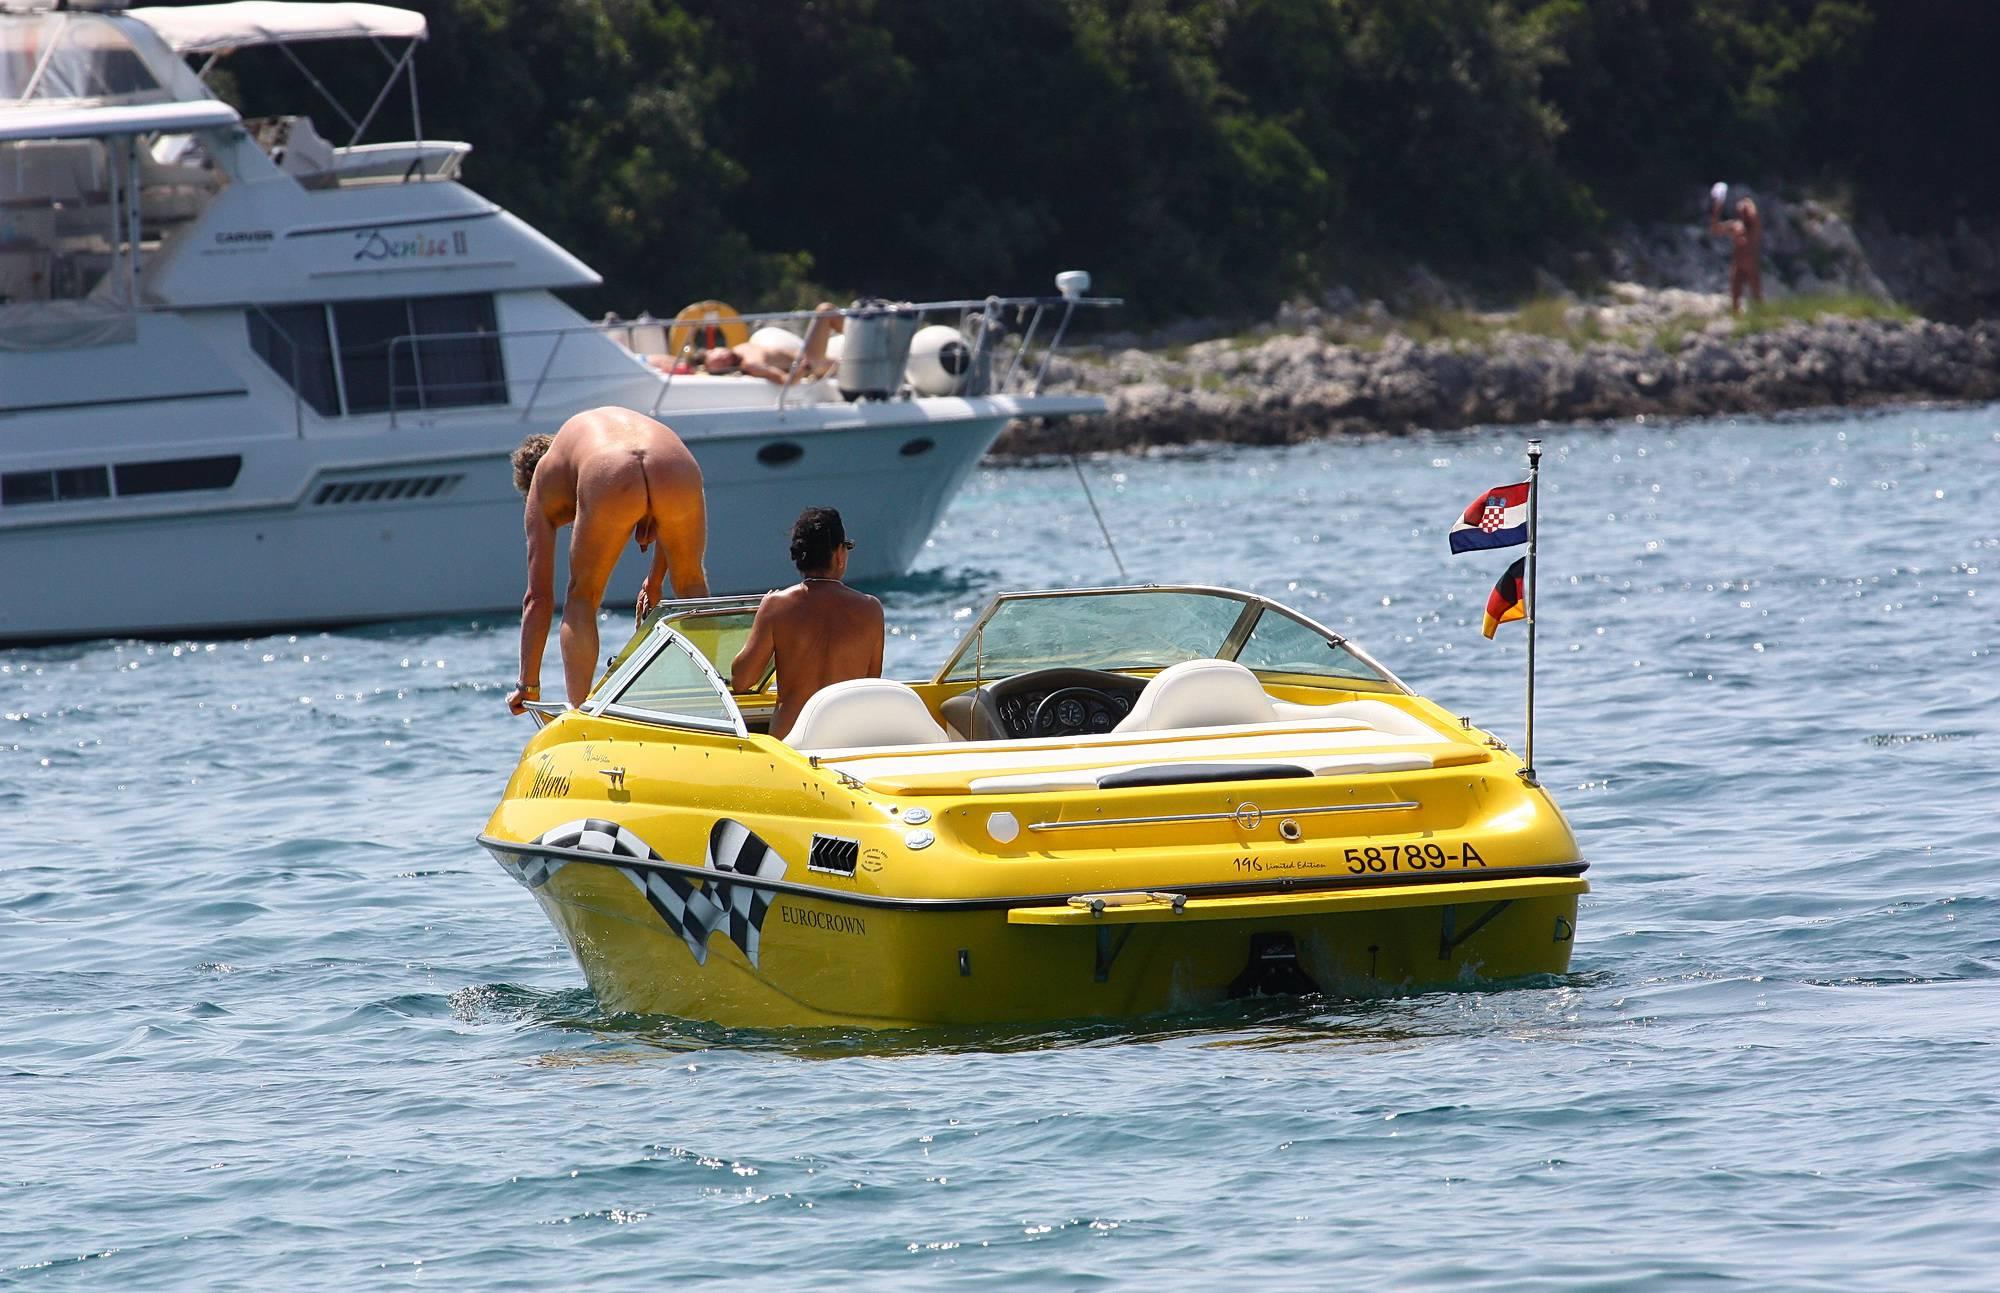 Pure Nudism Beautiful Boating Trip - 1